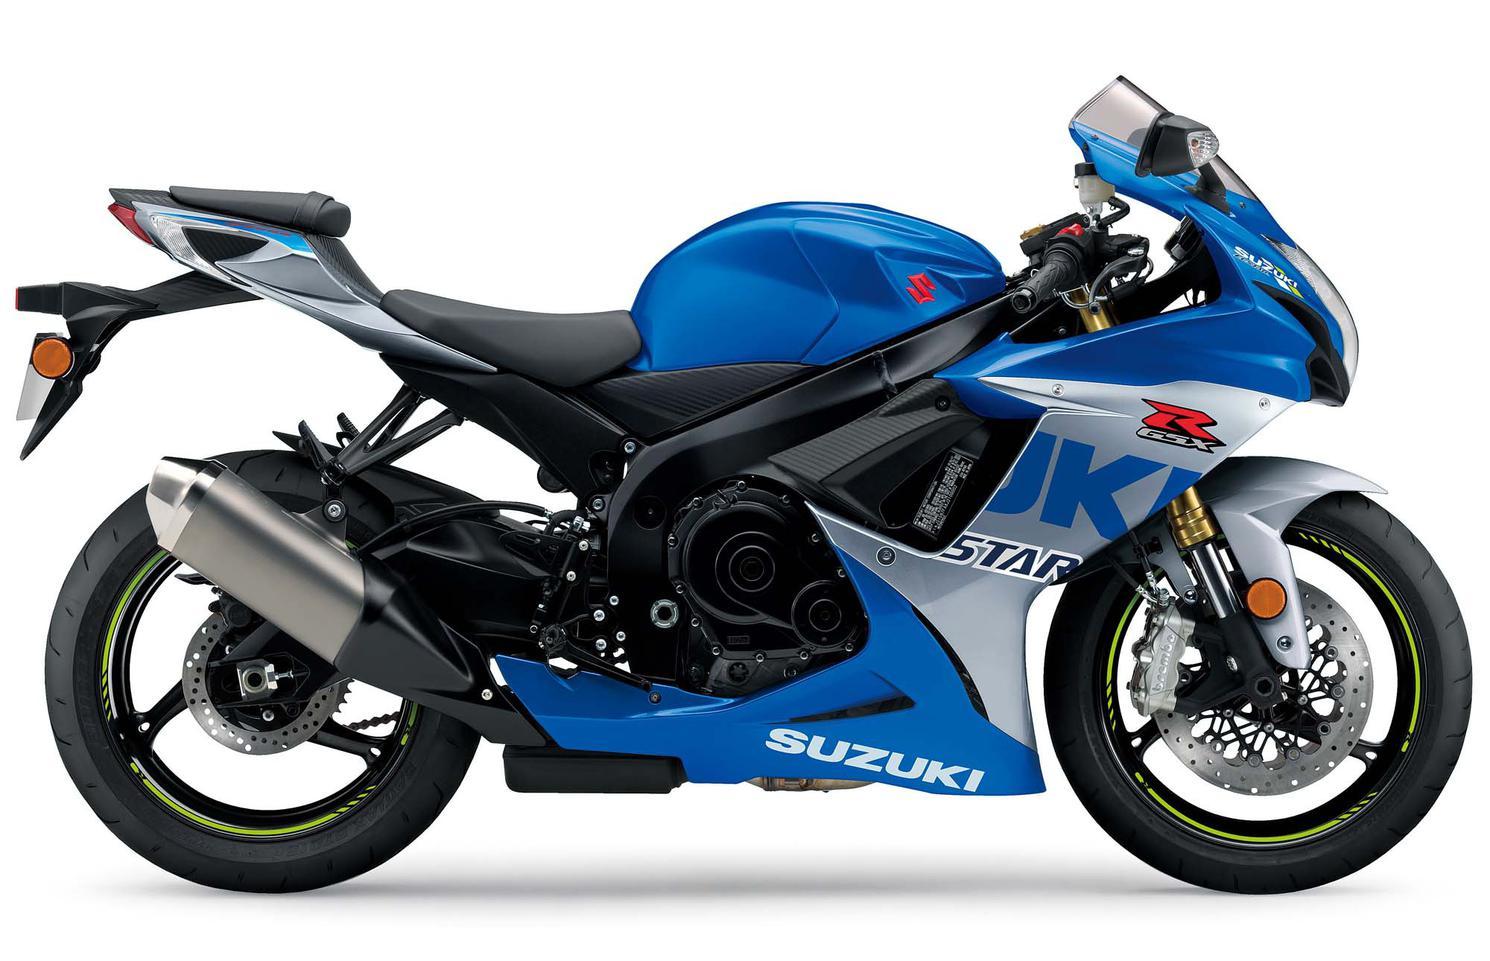 Suzuki GSX-R750 Bleu Triton Métallique / Argent Mystique Métallique 2021